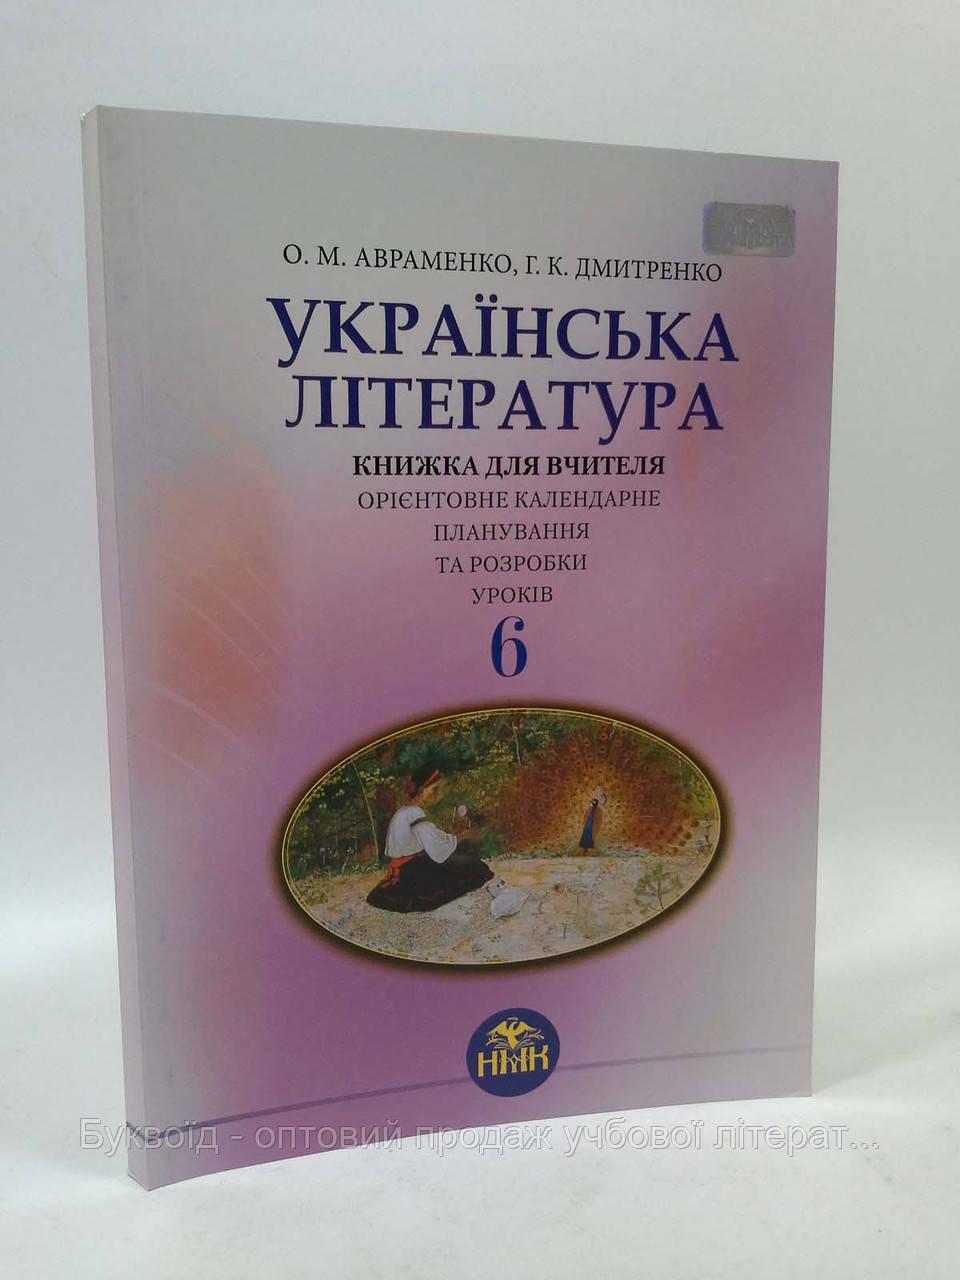 006 кл НП Грамота РУ Укр література 006 кл Книжка для вчителя Авраменко